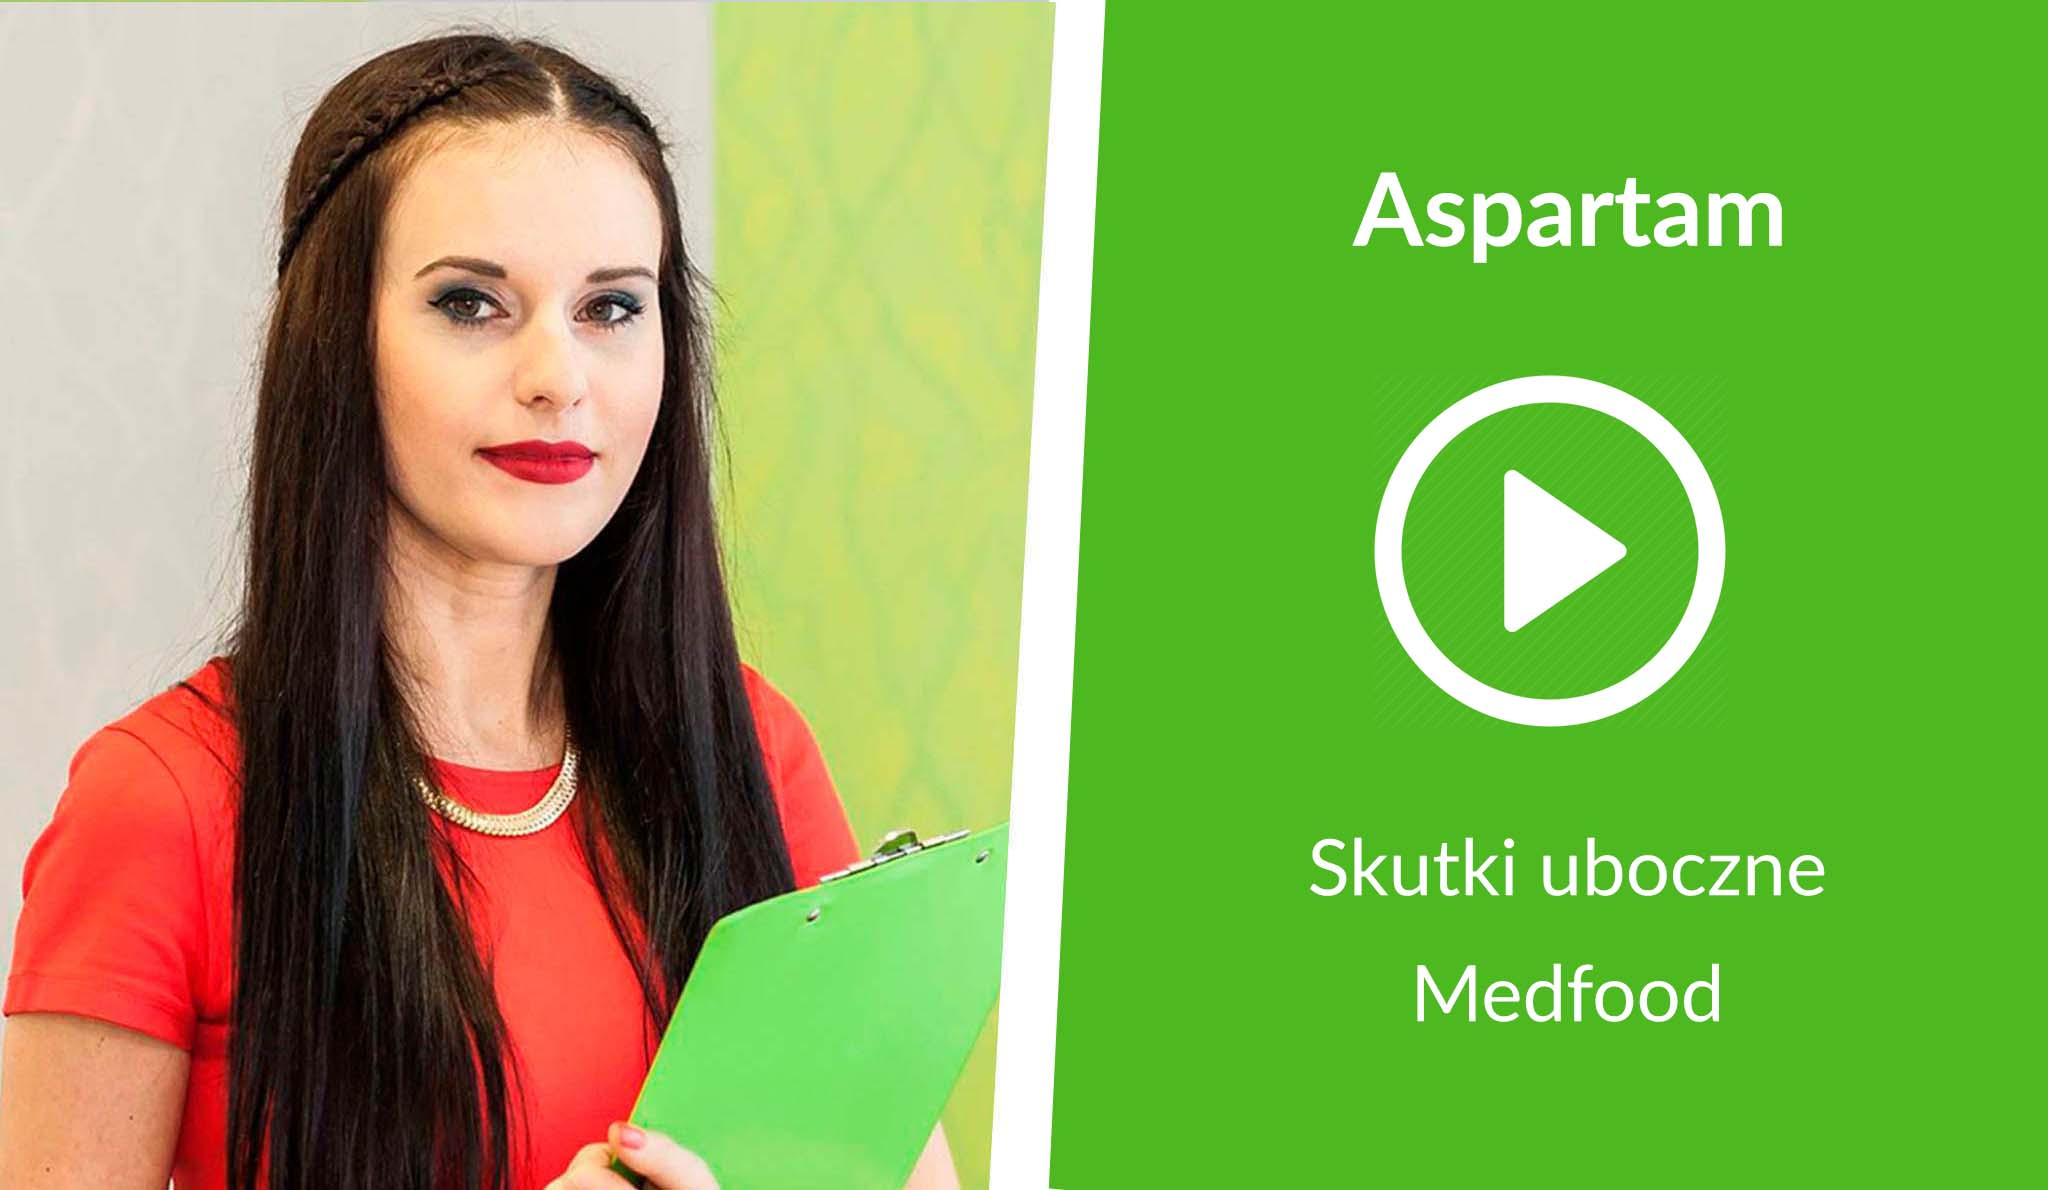 [Wideo] Medfood: Aspartam i jego skutki uboczne